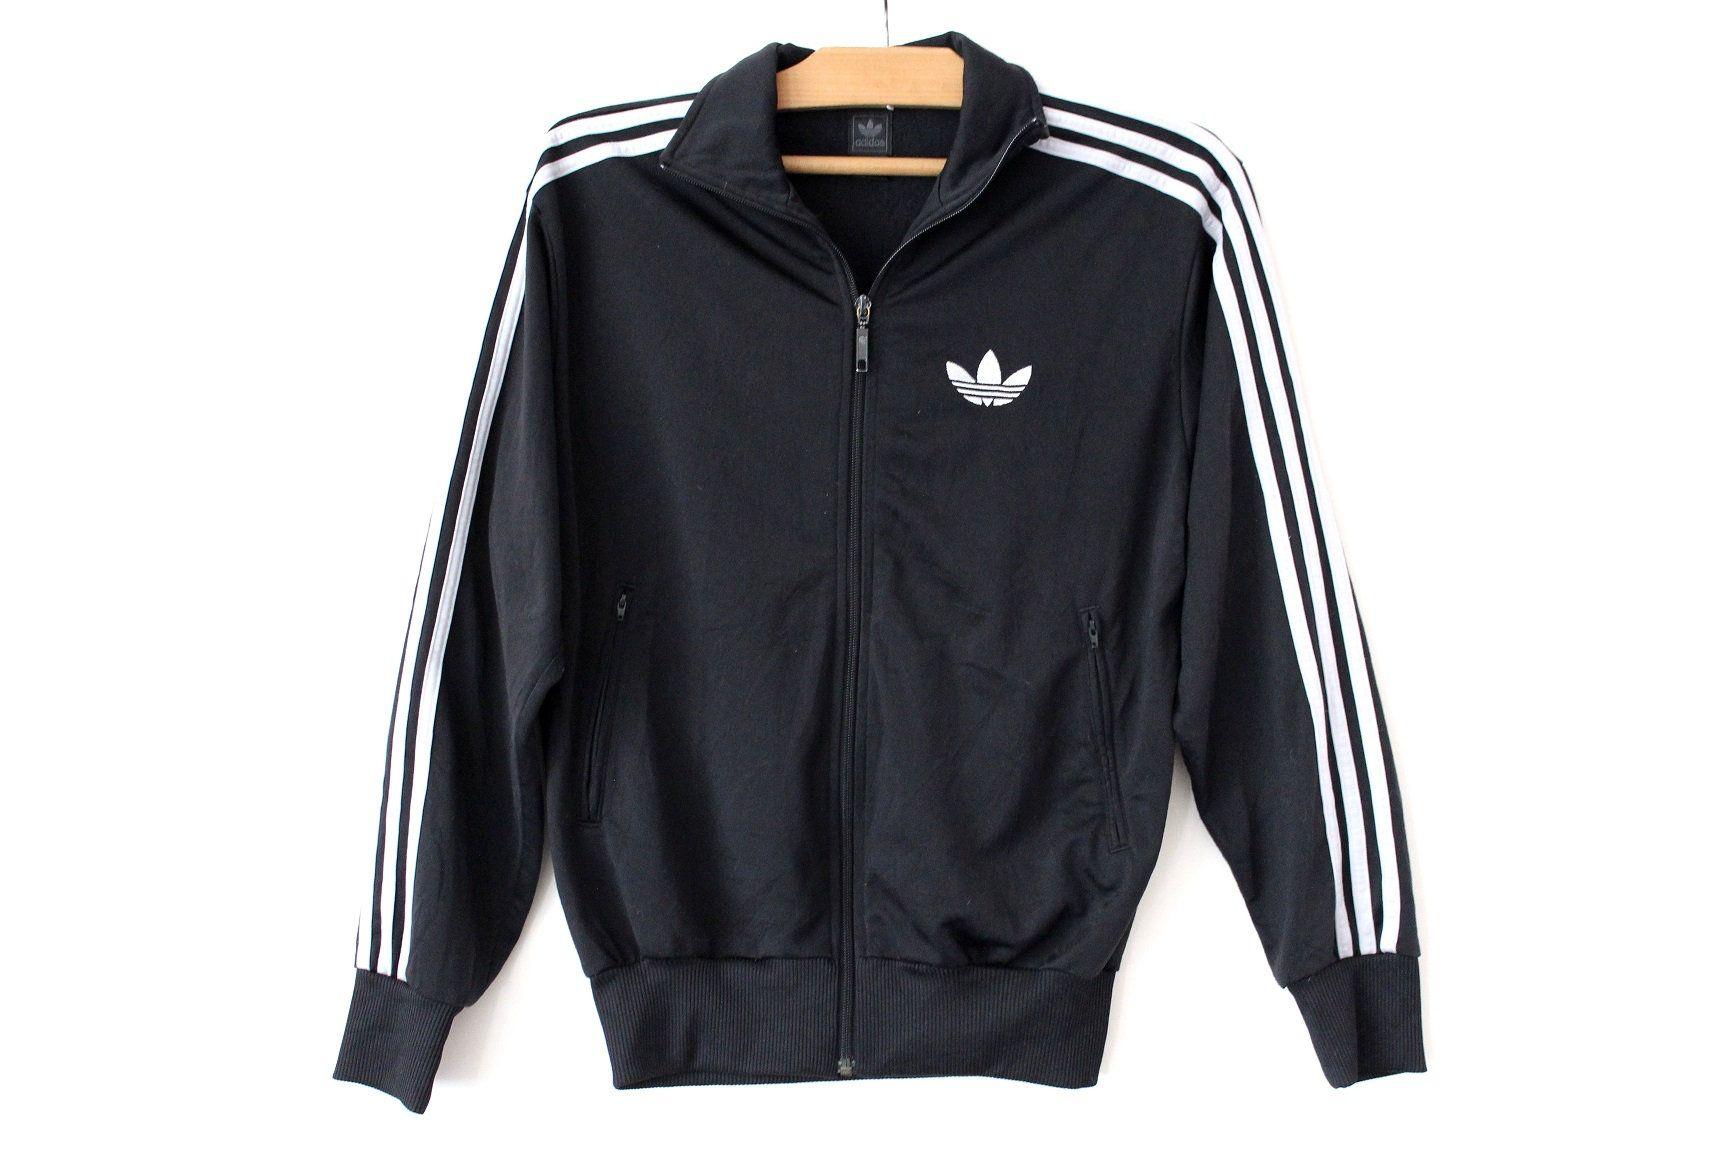 Black Silver Adidas Jacket Vintage Adidas Tracksuit Adidas Tennis Top Zip Up Adidas Sweatshirt Hip Hop St Adidas Tracksuit Tracksuit Tops Adidas Sweatshirt